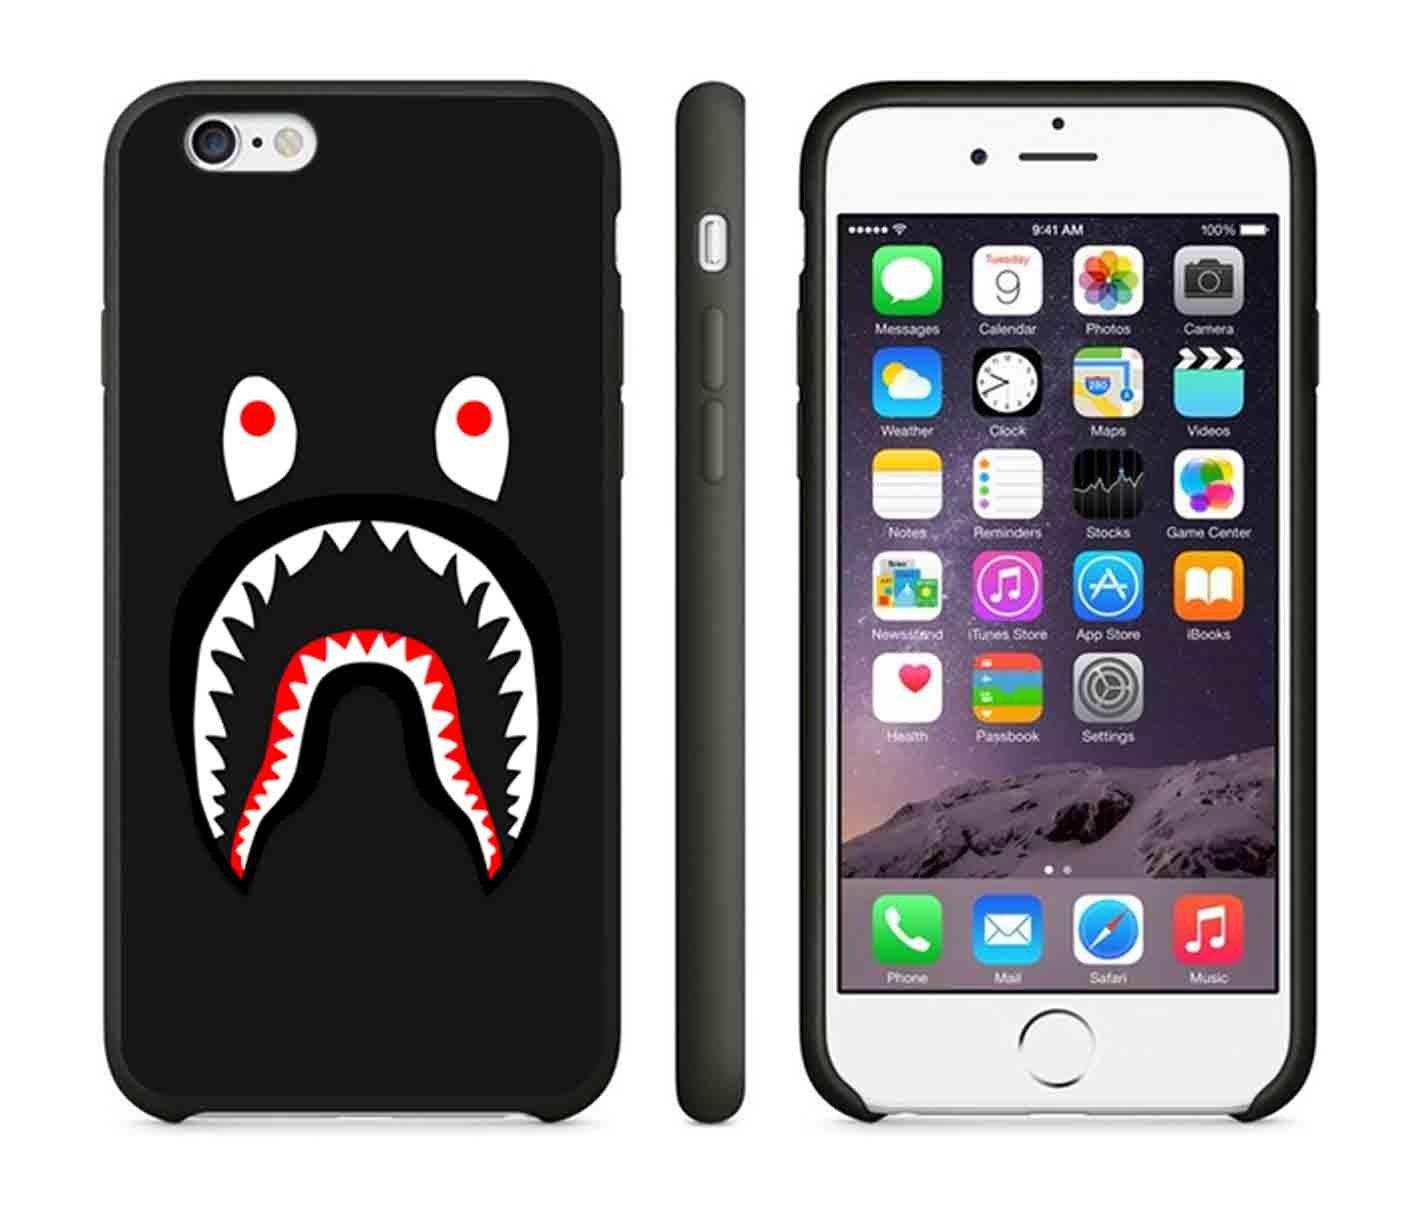 Bape Shark Iphone Case Iphone  Case Or Iphone S Black Rubber Gxzqk Amazon Co Uk Electronics